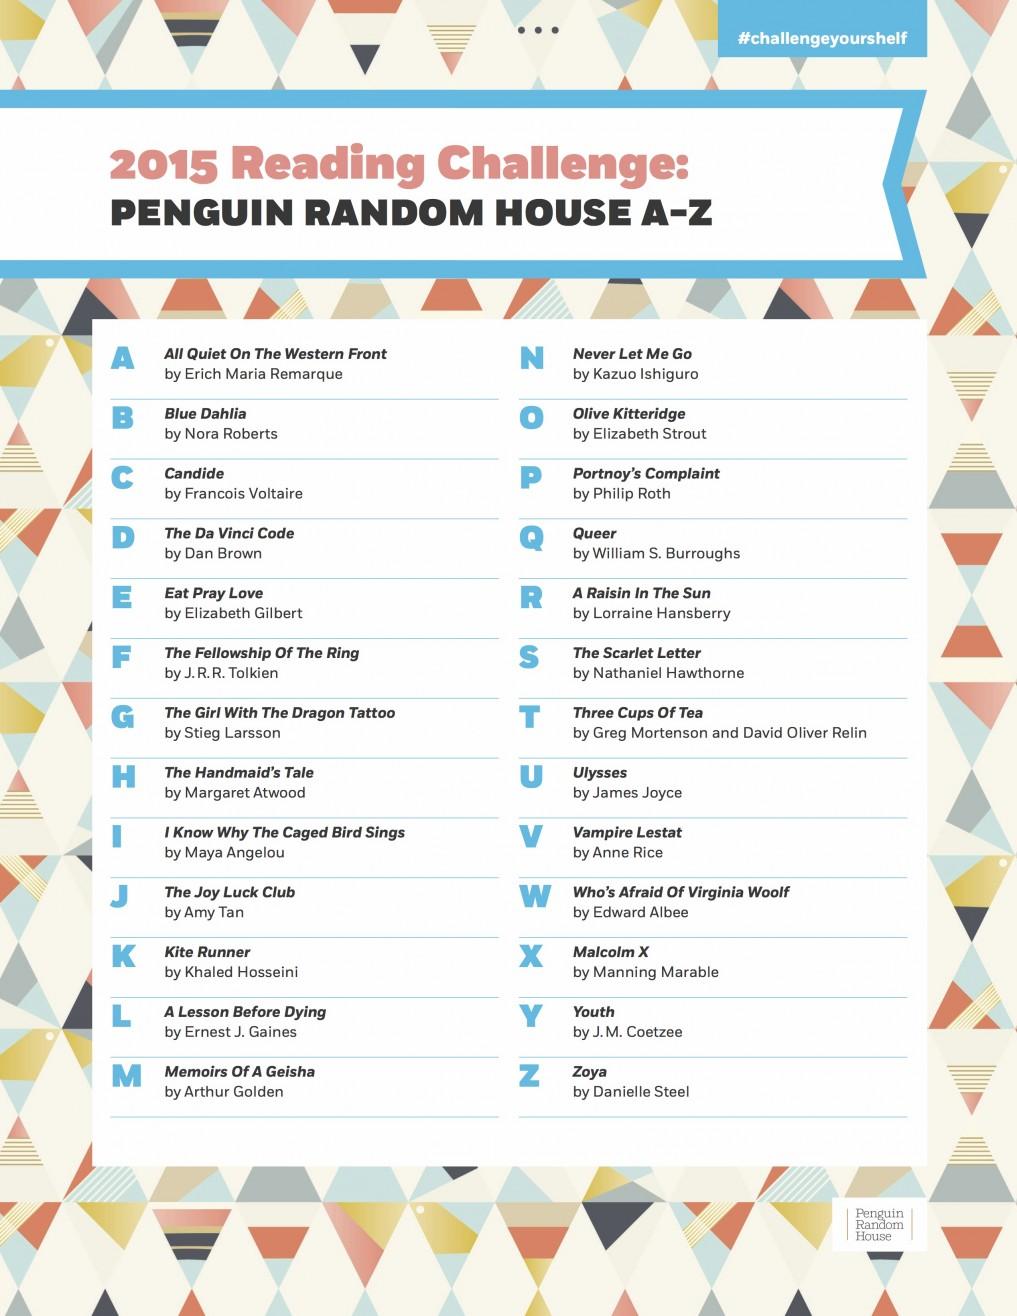 readingchallenge-2015-penguinrandomhouse-AtoZ (1)